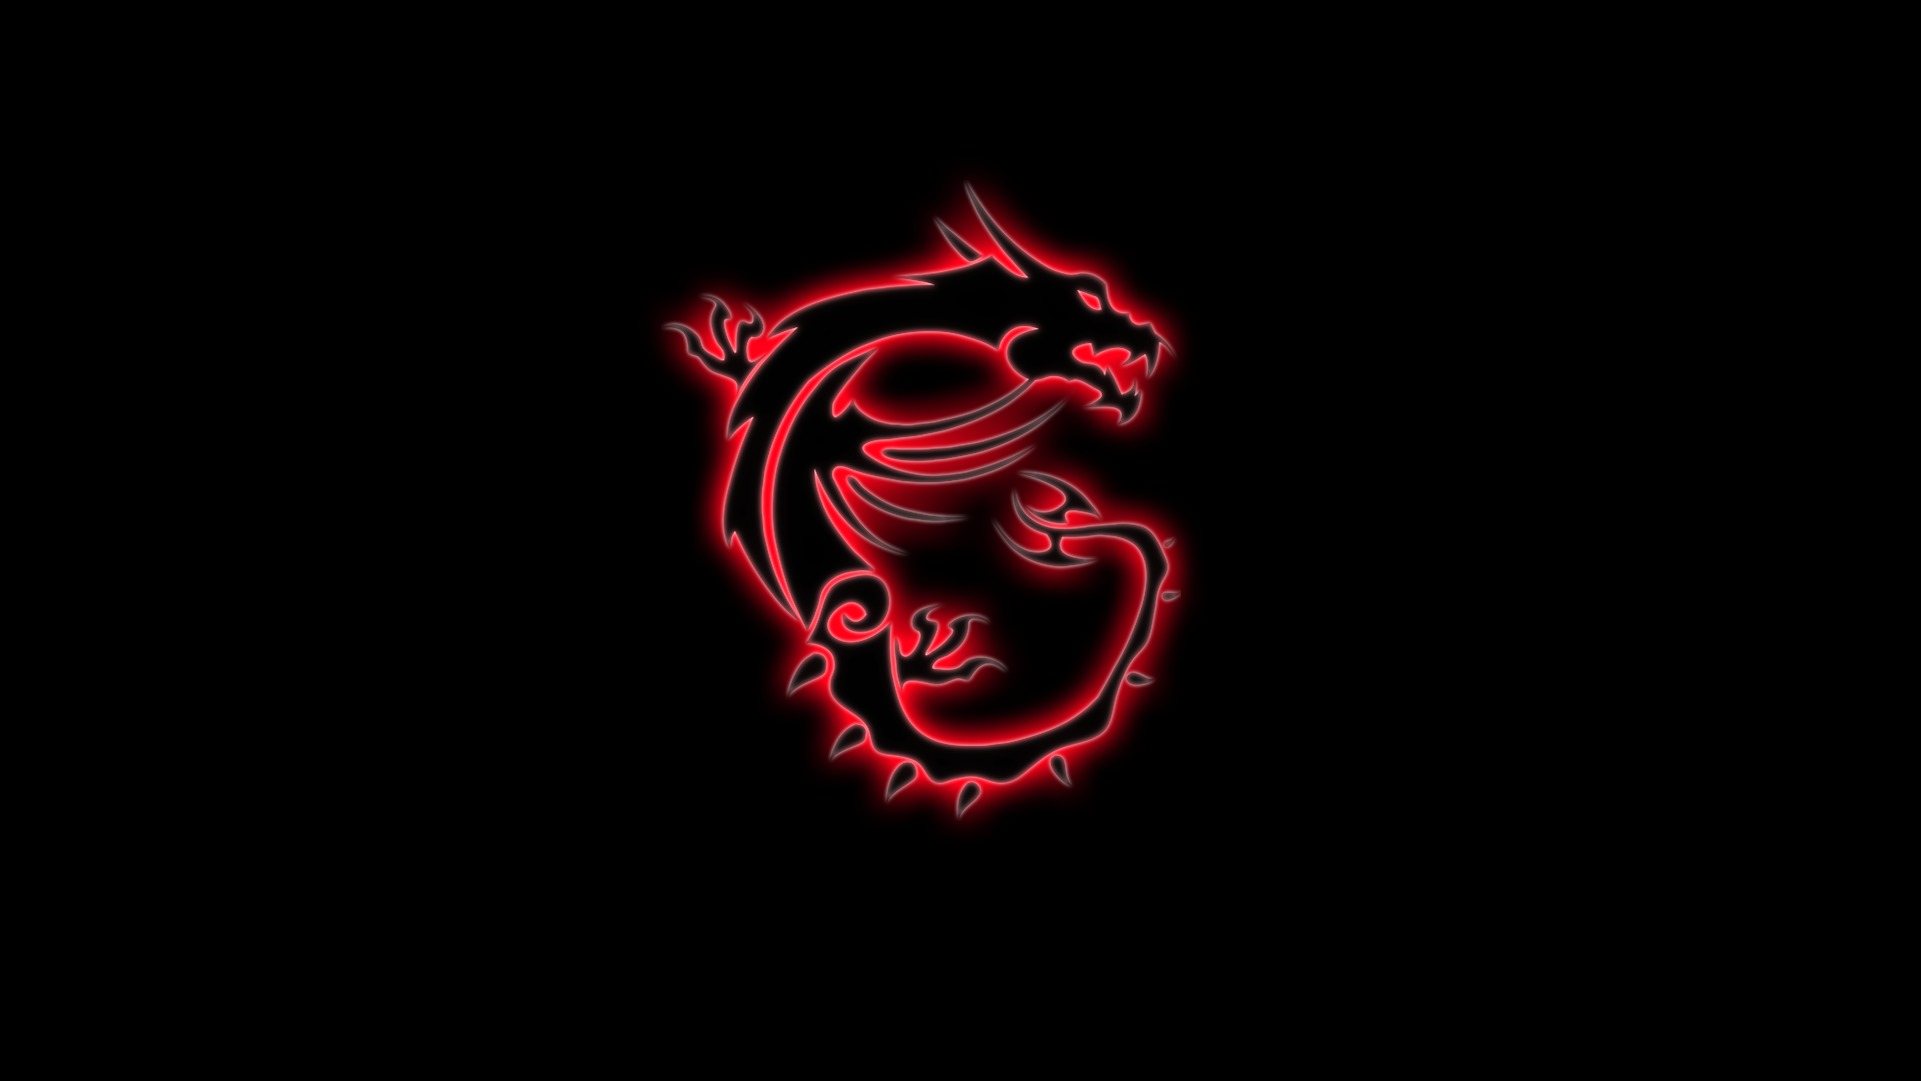 [47+] Red Dragon Gaming Wallpaper on WallpaperSafari